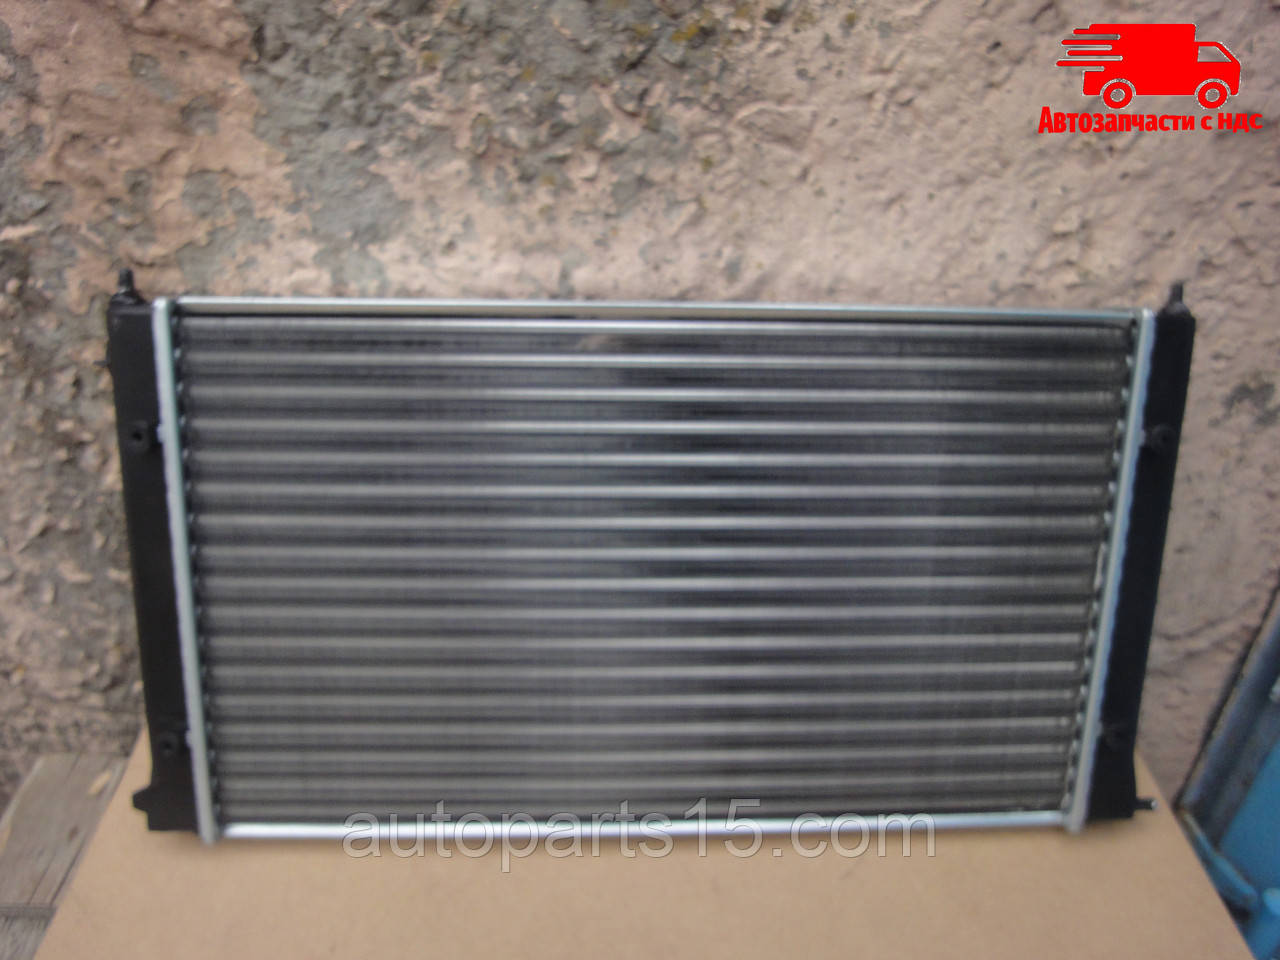 Радиатор охлаждения  VOLKSWAGEN   GOLF II/JETTA 84-91 (TEMPEST) . TP.15.65.1511 . Ціна з ПДВ.